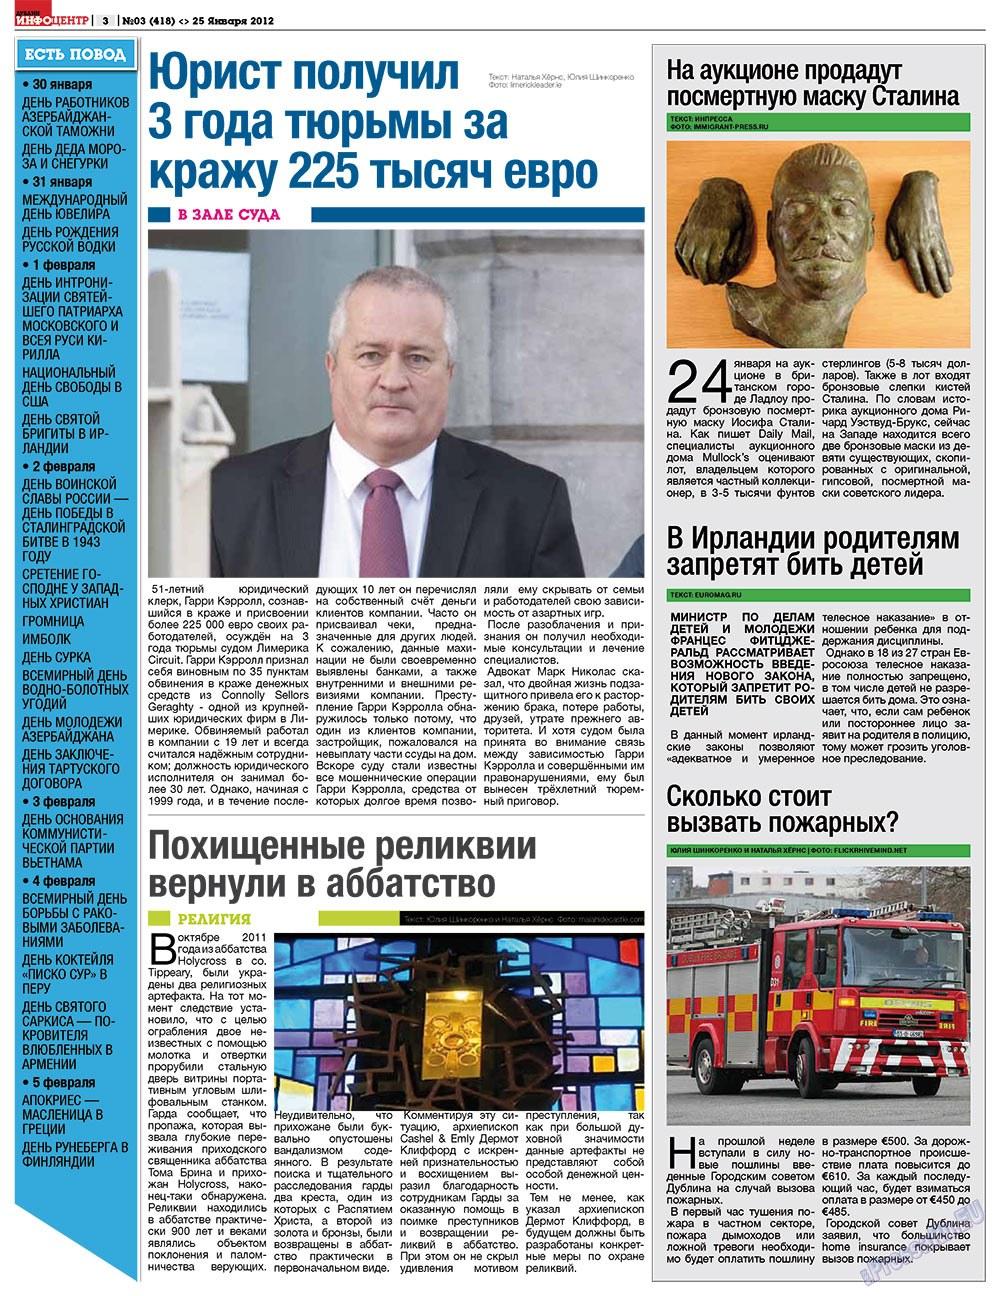 Дублин инфоцентр (газета). 2012 год, номер 3, стр. 3